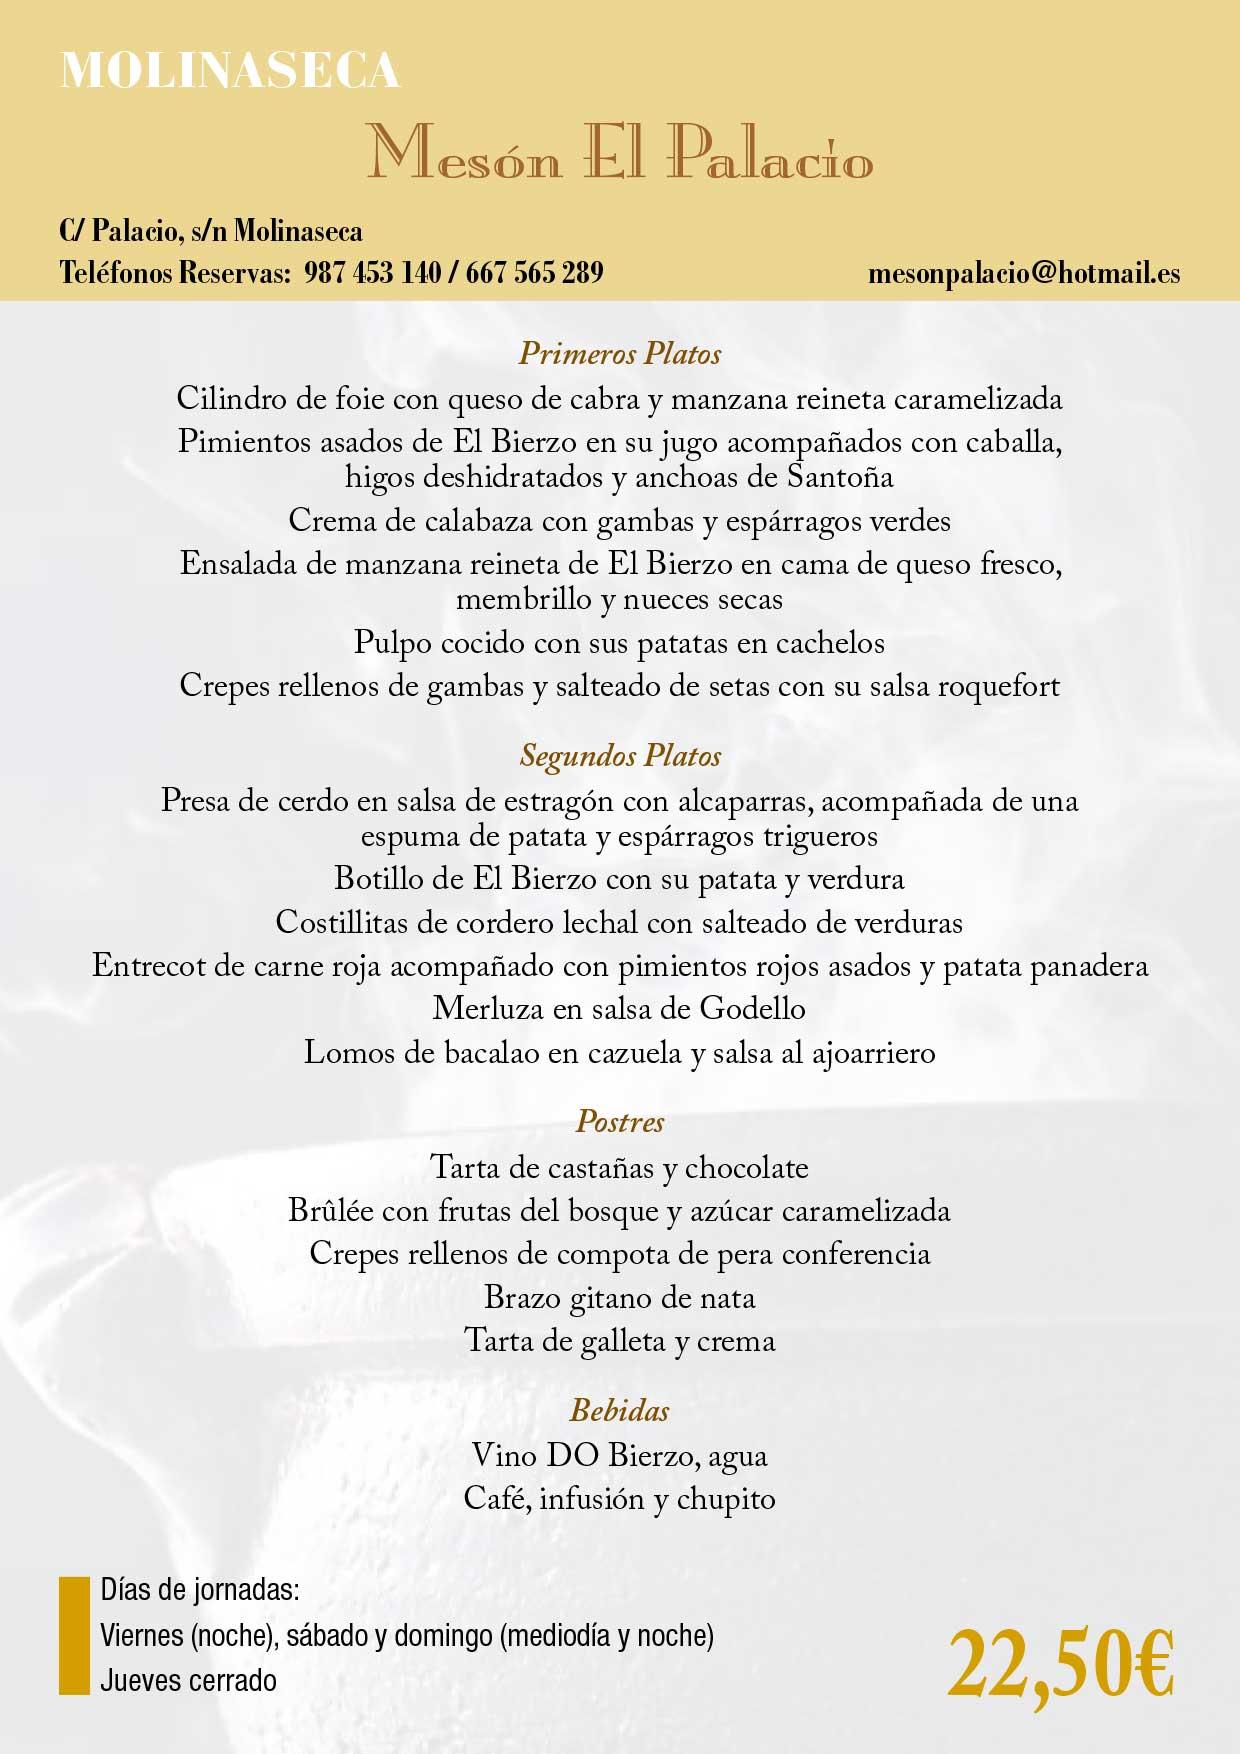 XXXIII Jornadas gastronómicas del Bierzo 2017. Restaurantes participantes 44